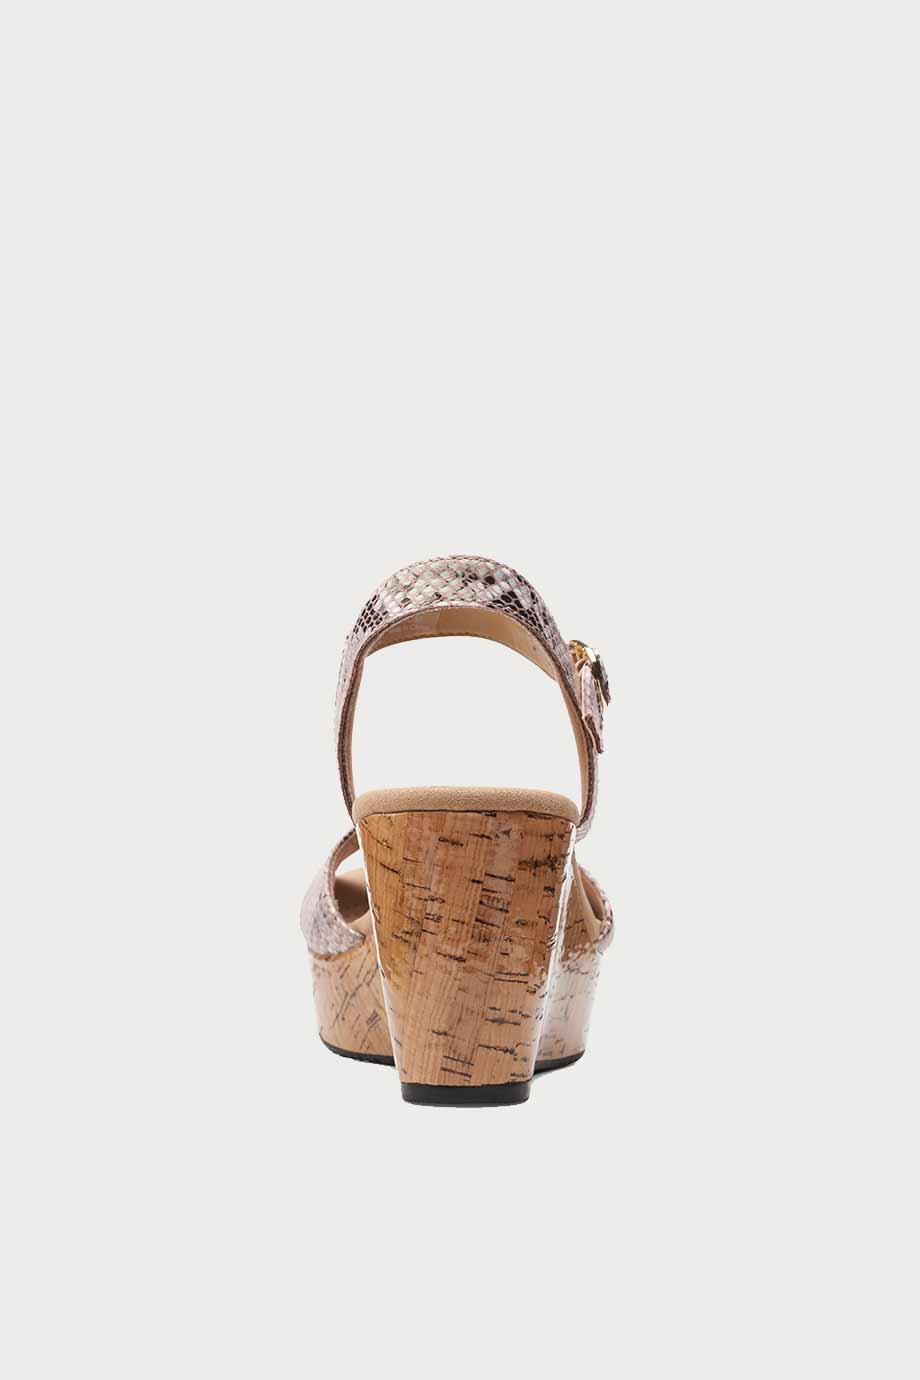 spiridoula metheniti shoes xalkida Annadel Mystic clarks natural snake 6